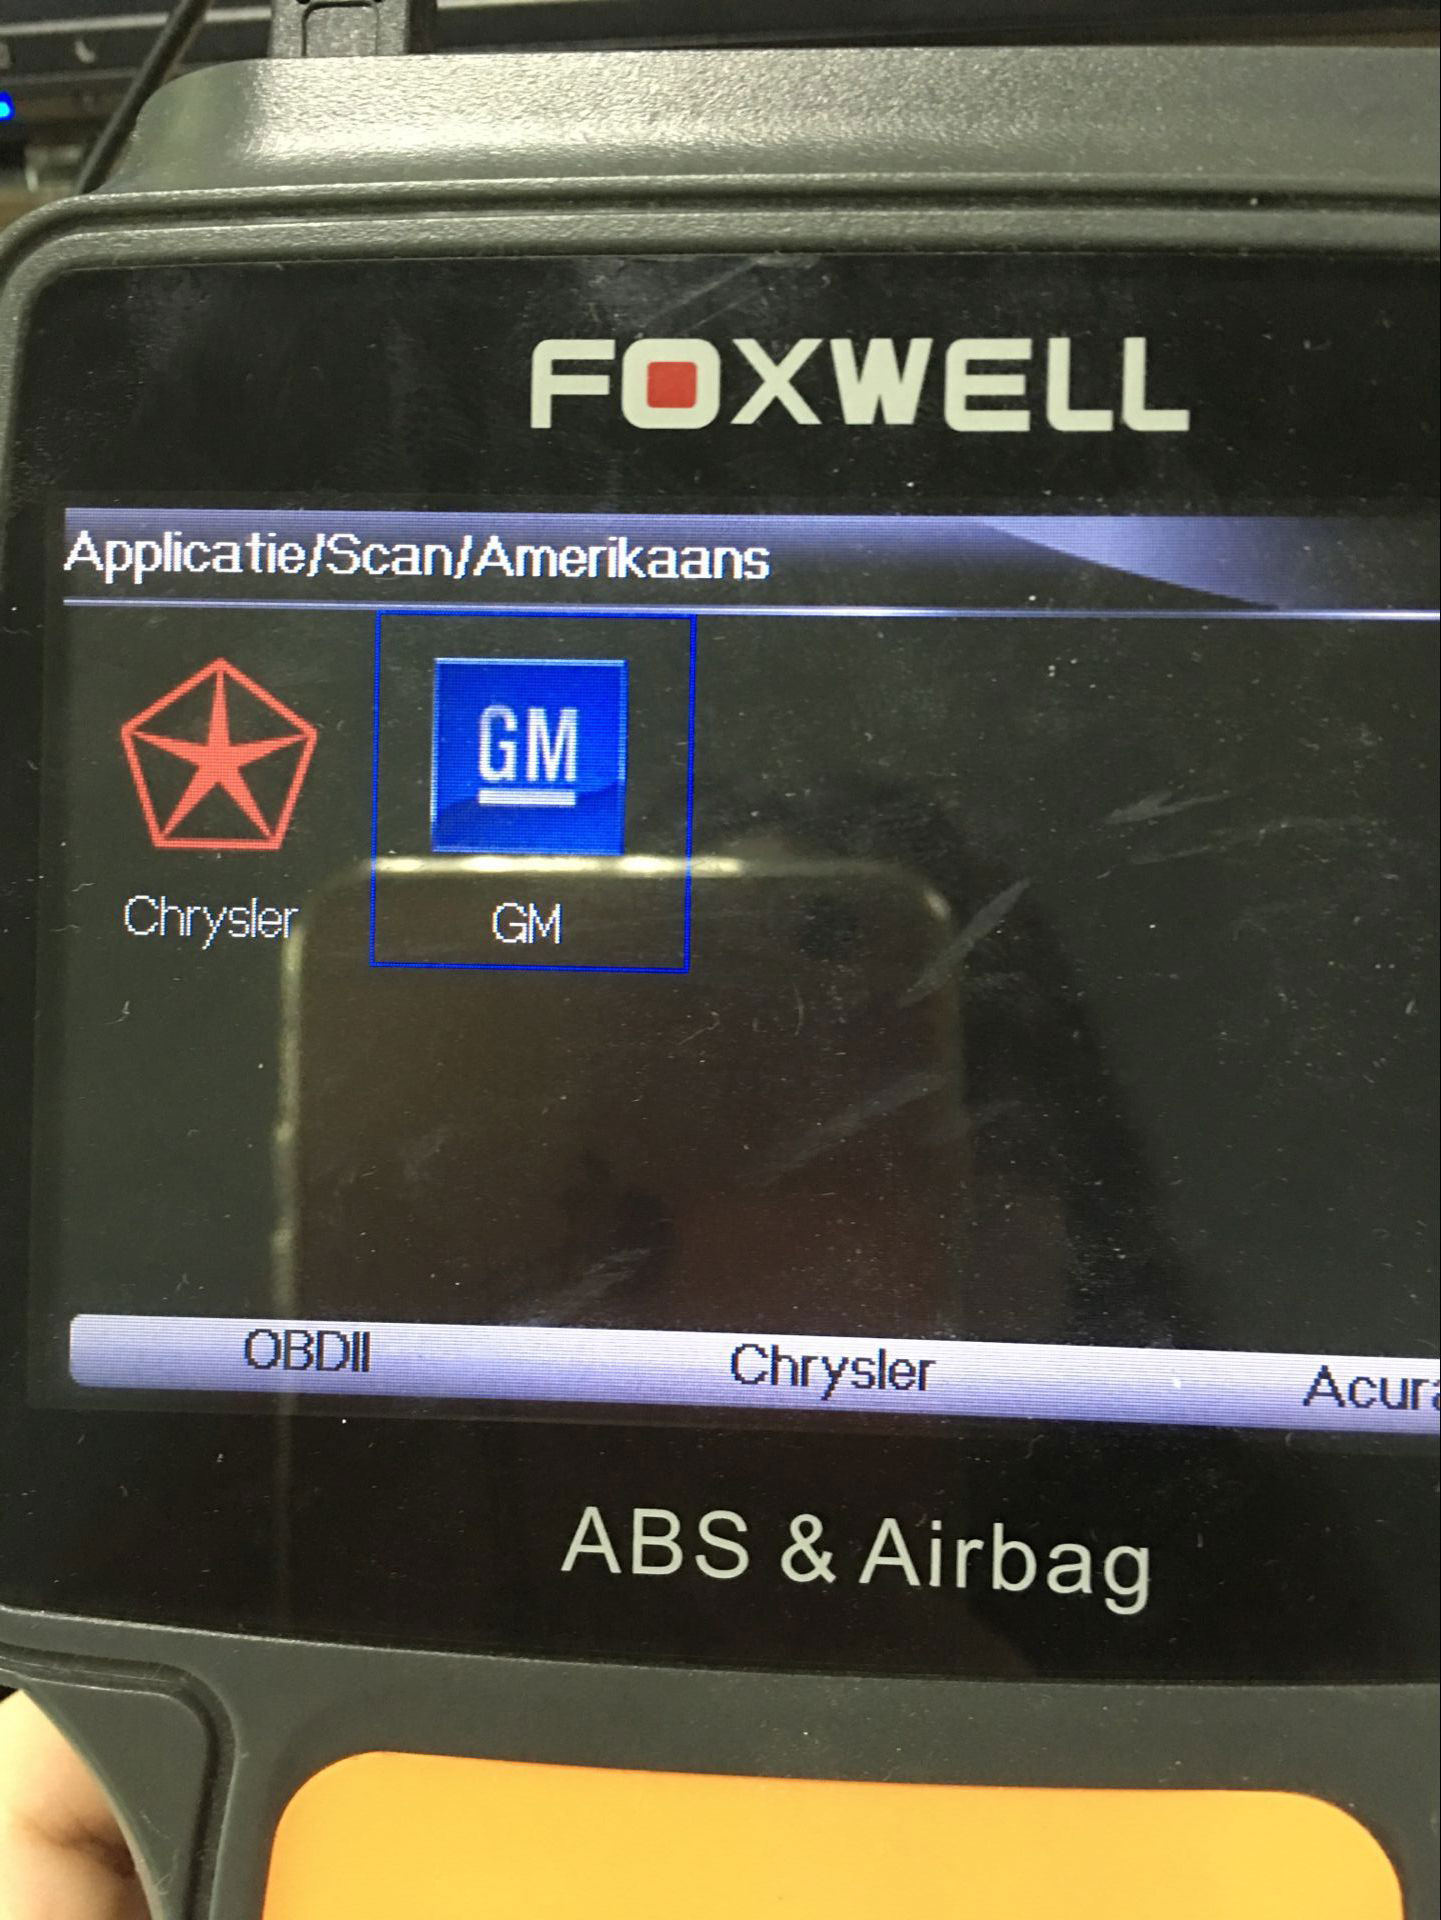 Original Foxwell Nt630 Reset Airbag On Gmc 2005 Truck